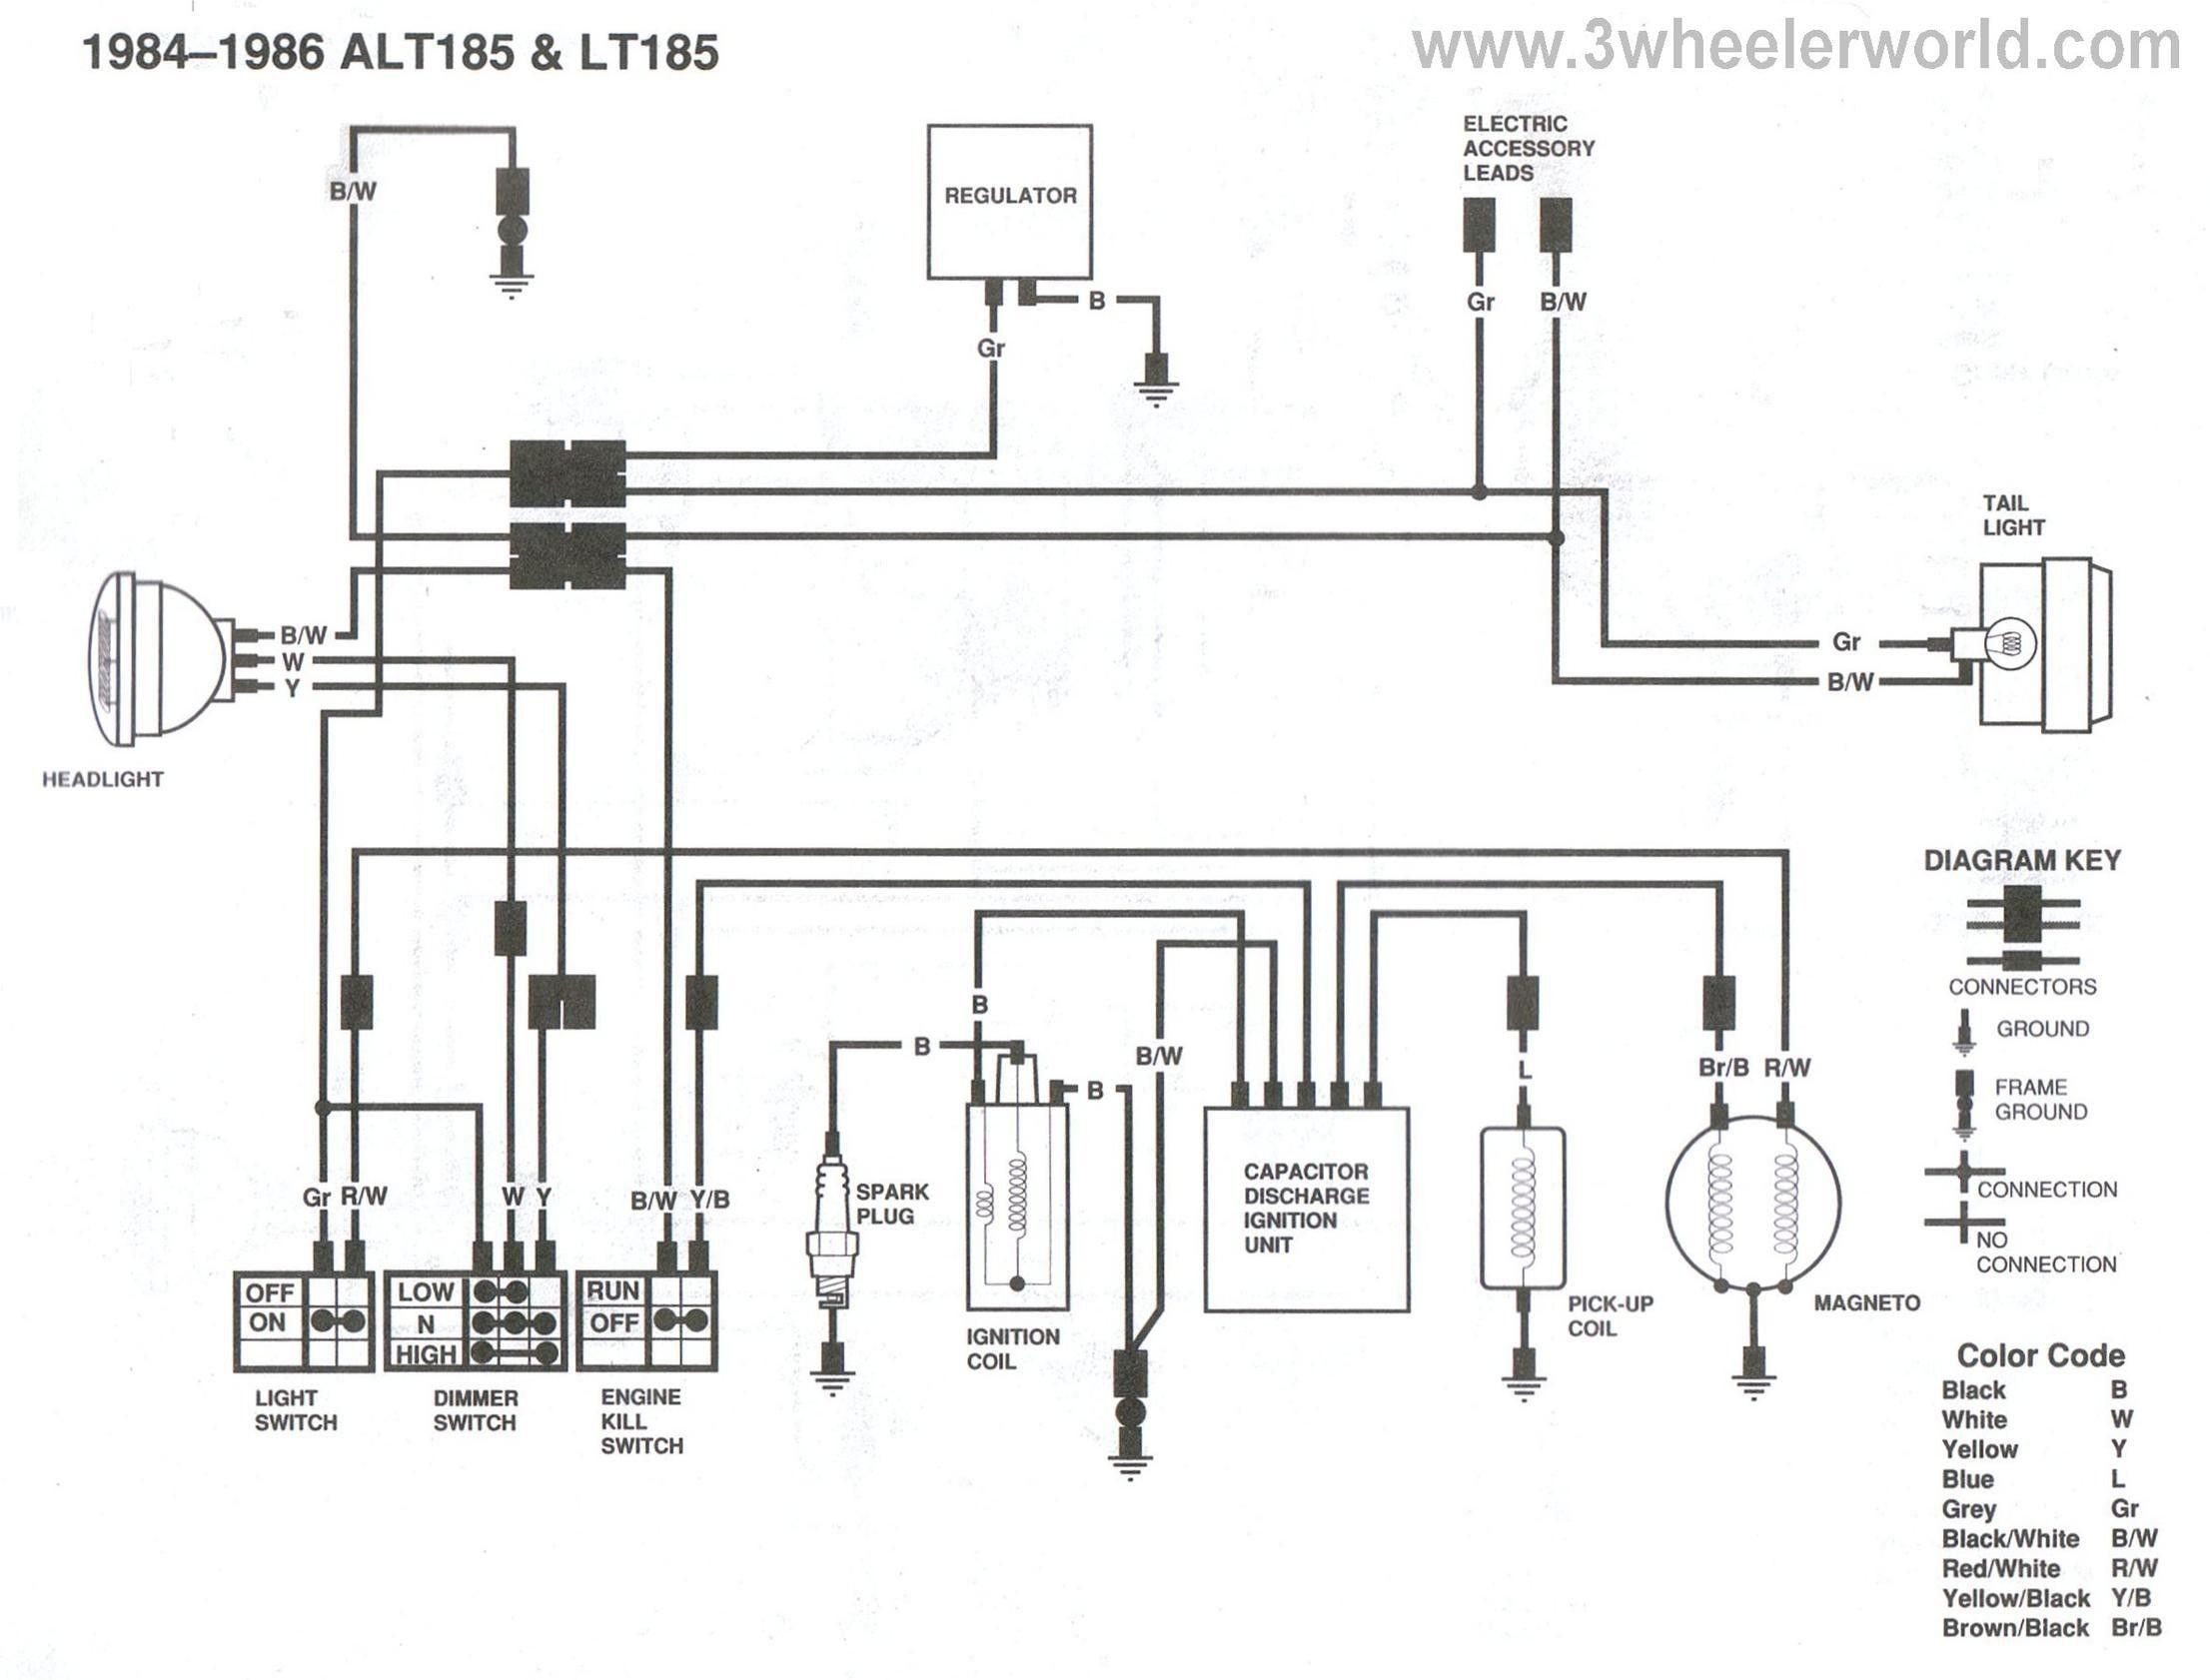 Bargman Breakaway Switch Instructions Suzuki Ignition Switch Diagram is300 Fuel Pump Wiring Of Bargman Breakaway Switch Instructions